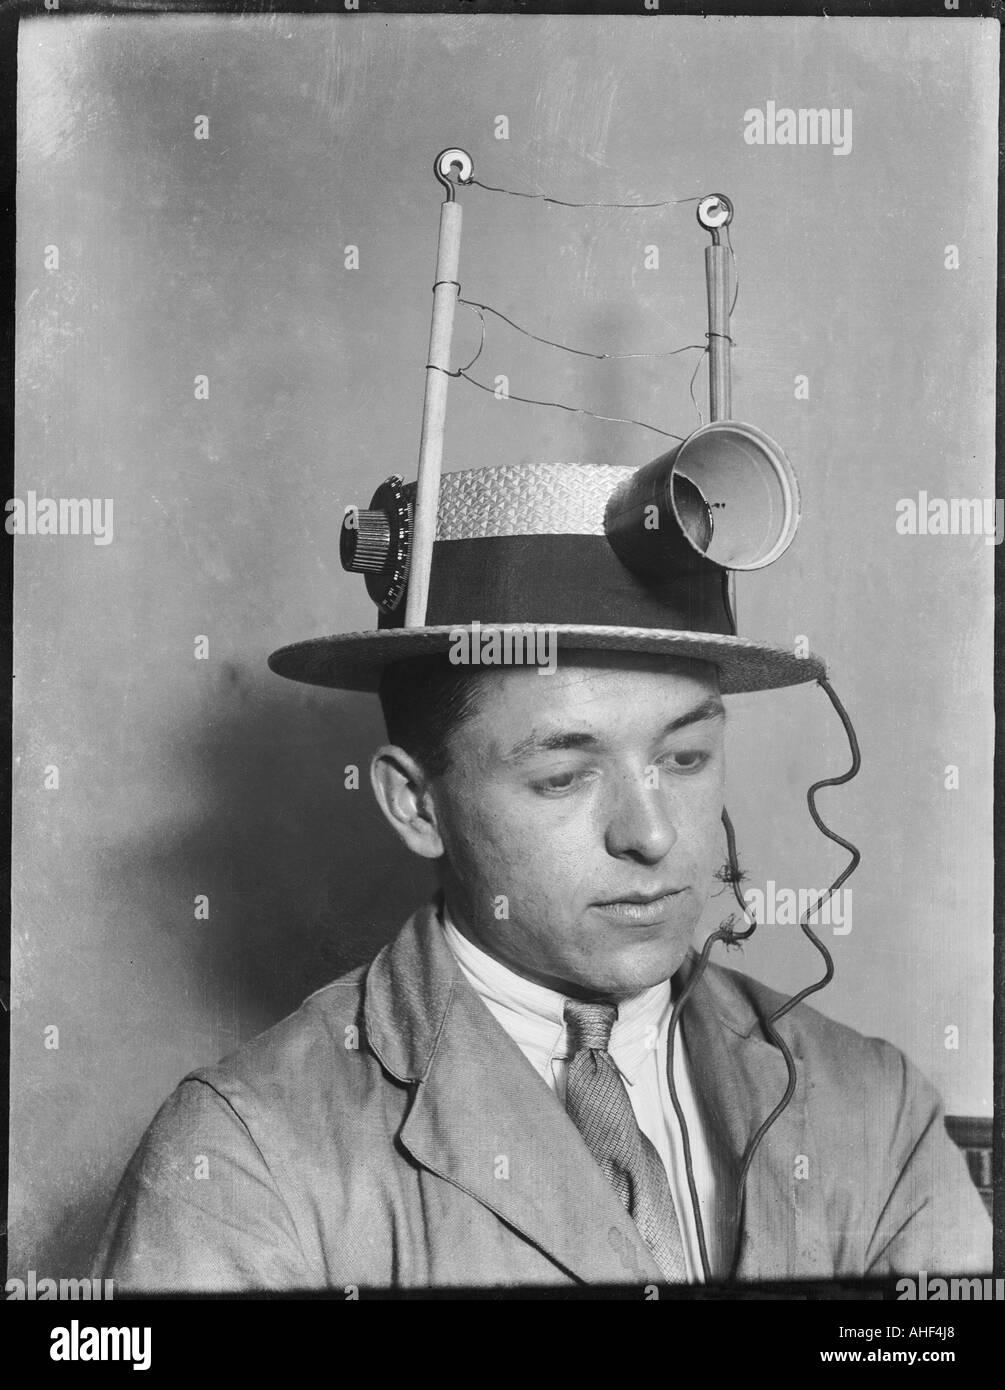 Hat Wireless 1930s - Stock Image